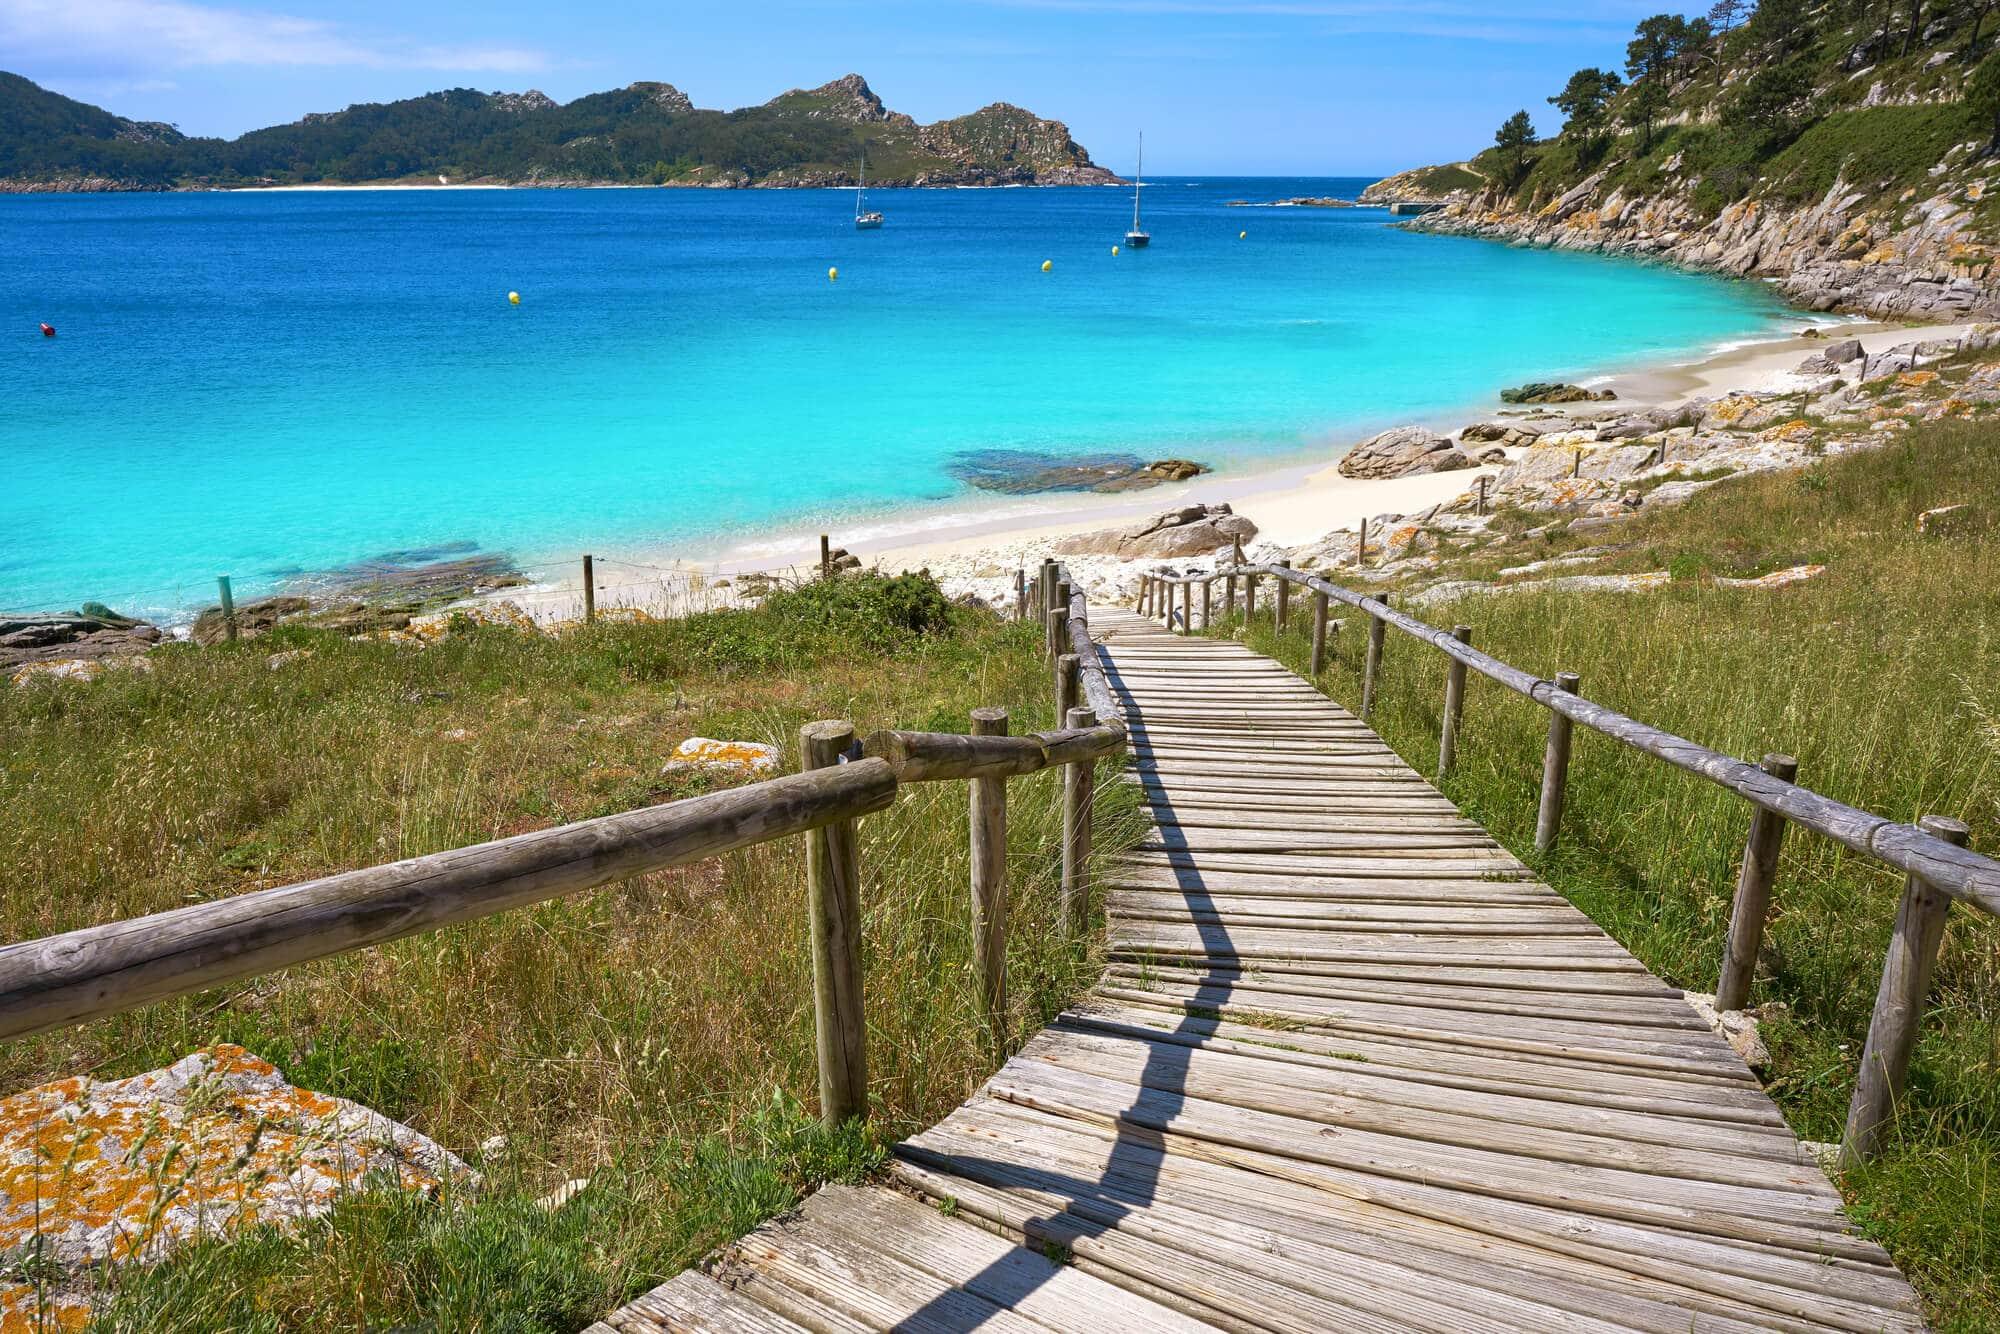 The beautiful white Nostra Senora beach on the island of Vigo, Cíes Islands - The Ultimate Spain Bucket List